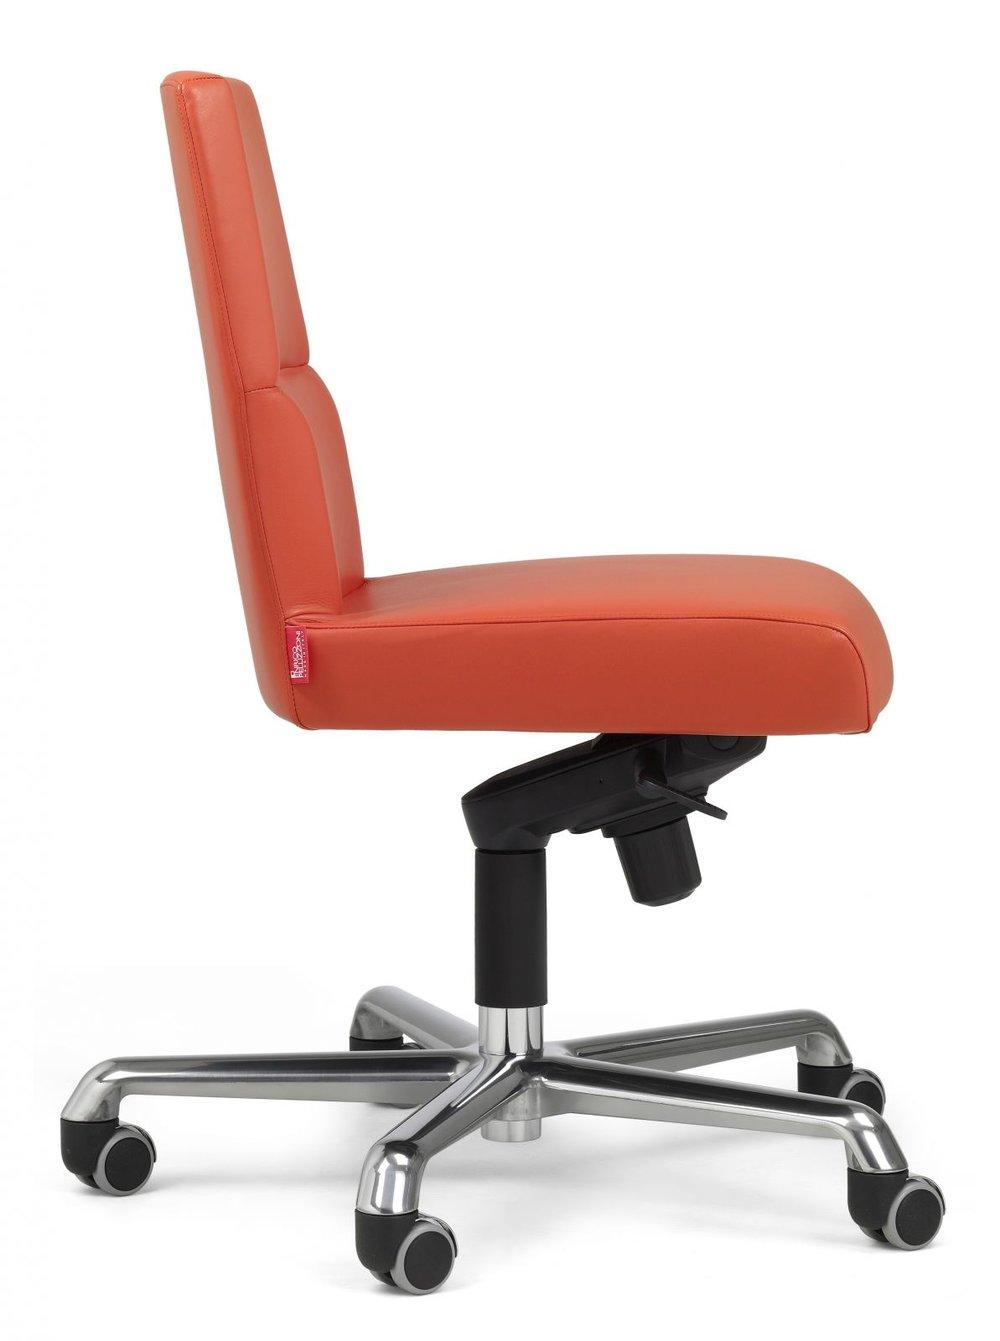 modern-office-chairs-Italian-furniture-designer-chairs (25).jpg